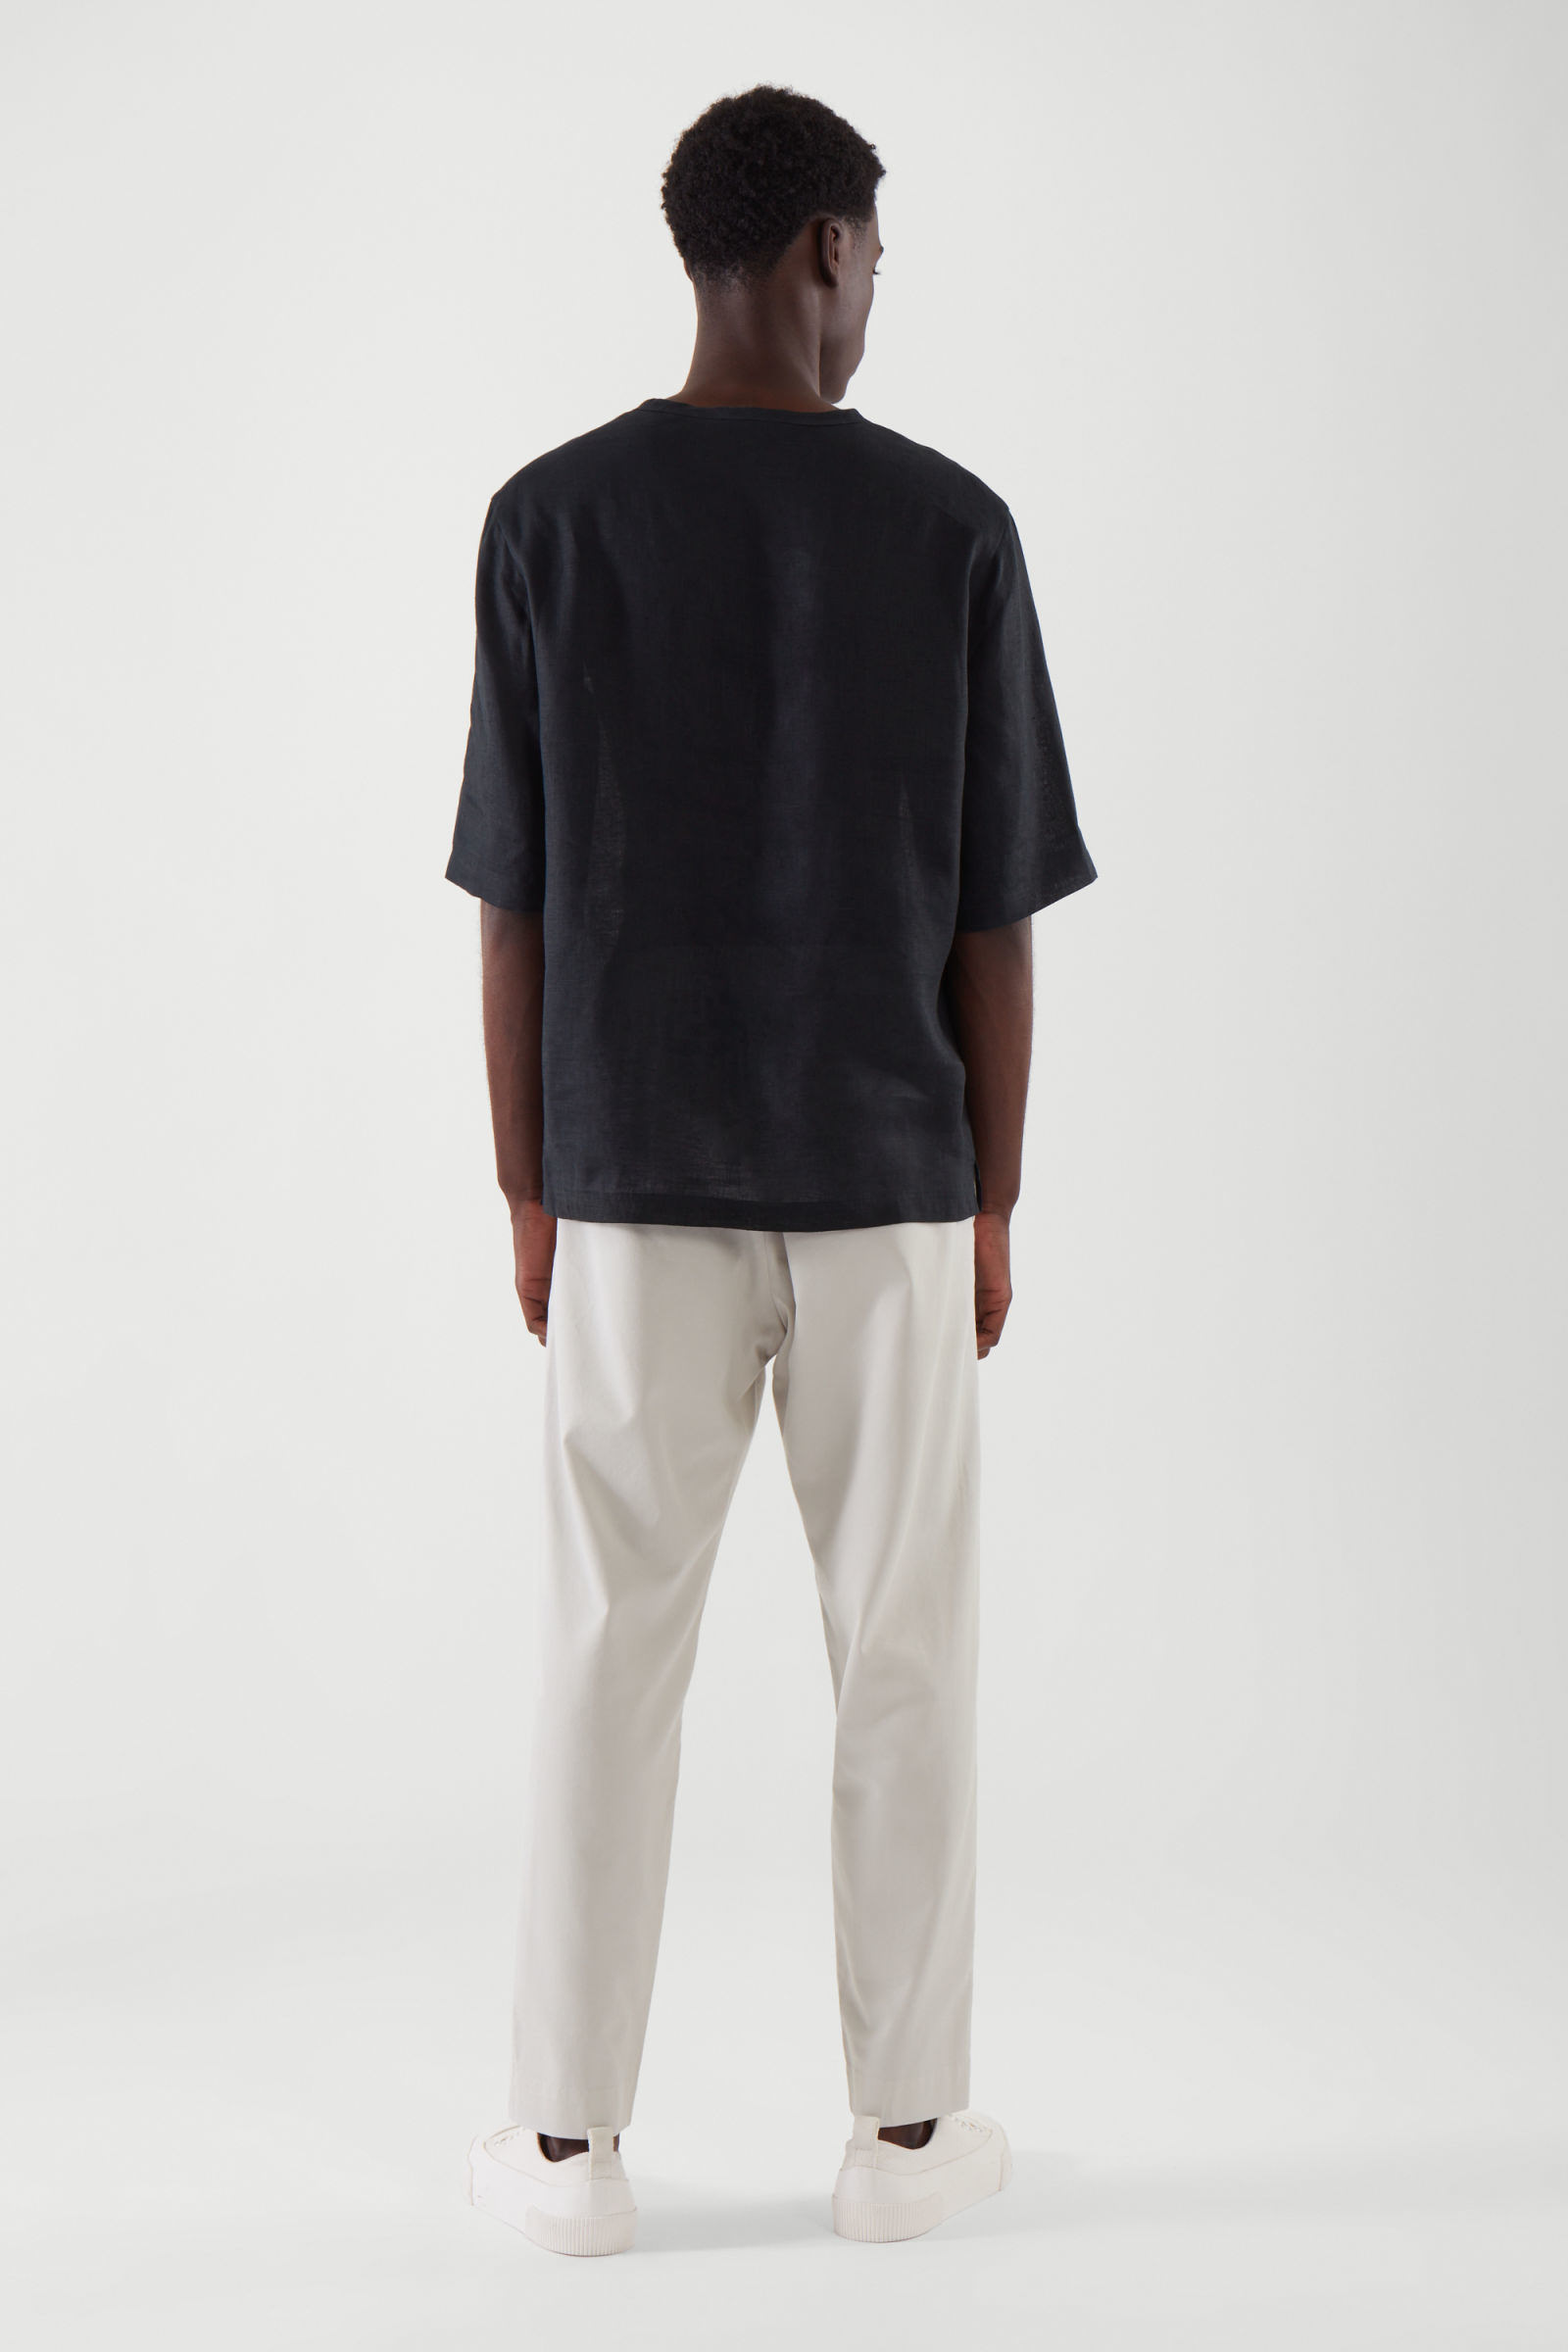 COS 릴랙스드 핏 헴프 티셔츠의 블랙컬러 ECOMLook입니다.